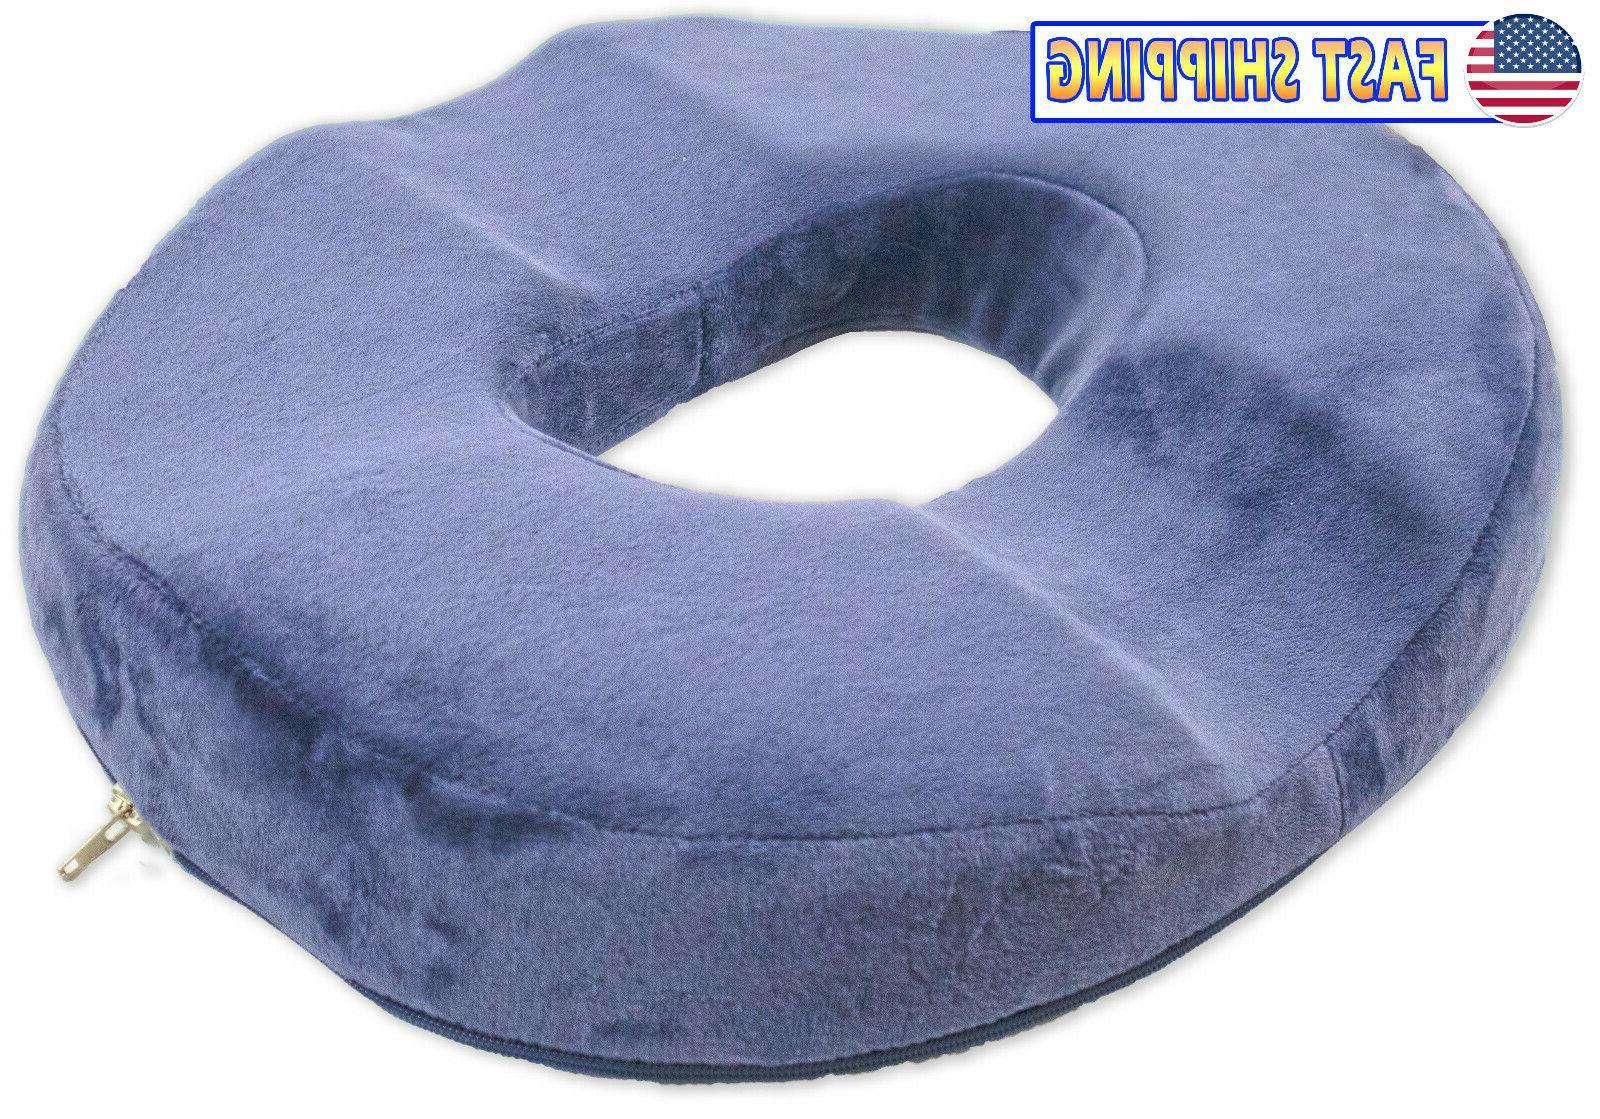 orthopedic donut seat cushion memory foam cushion